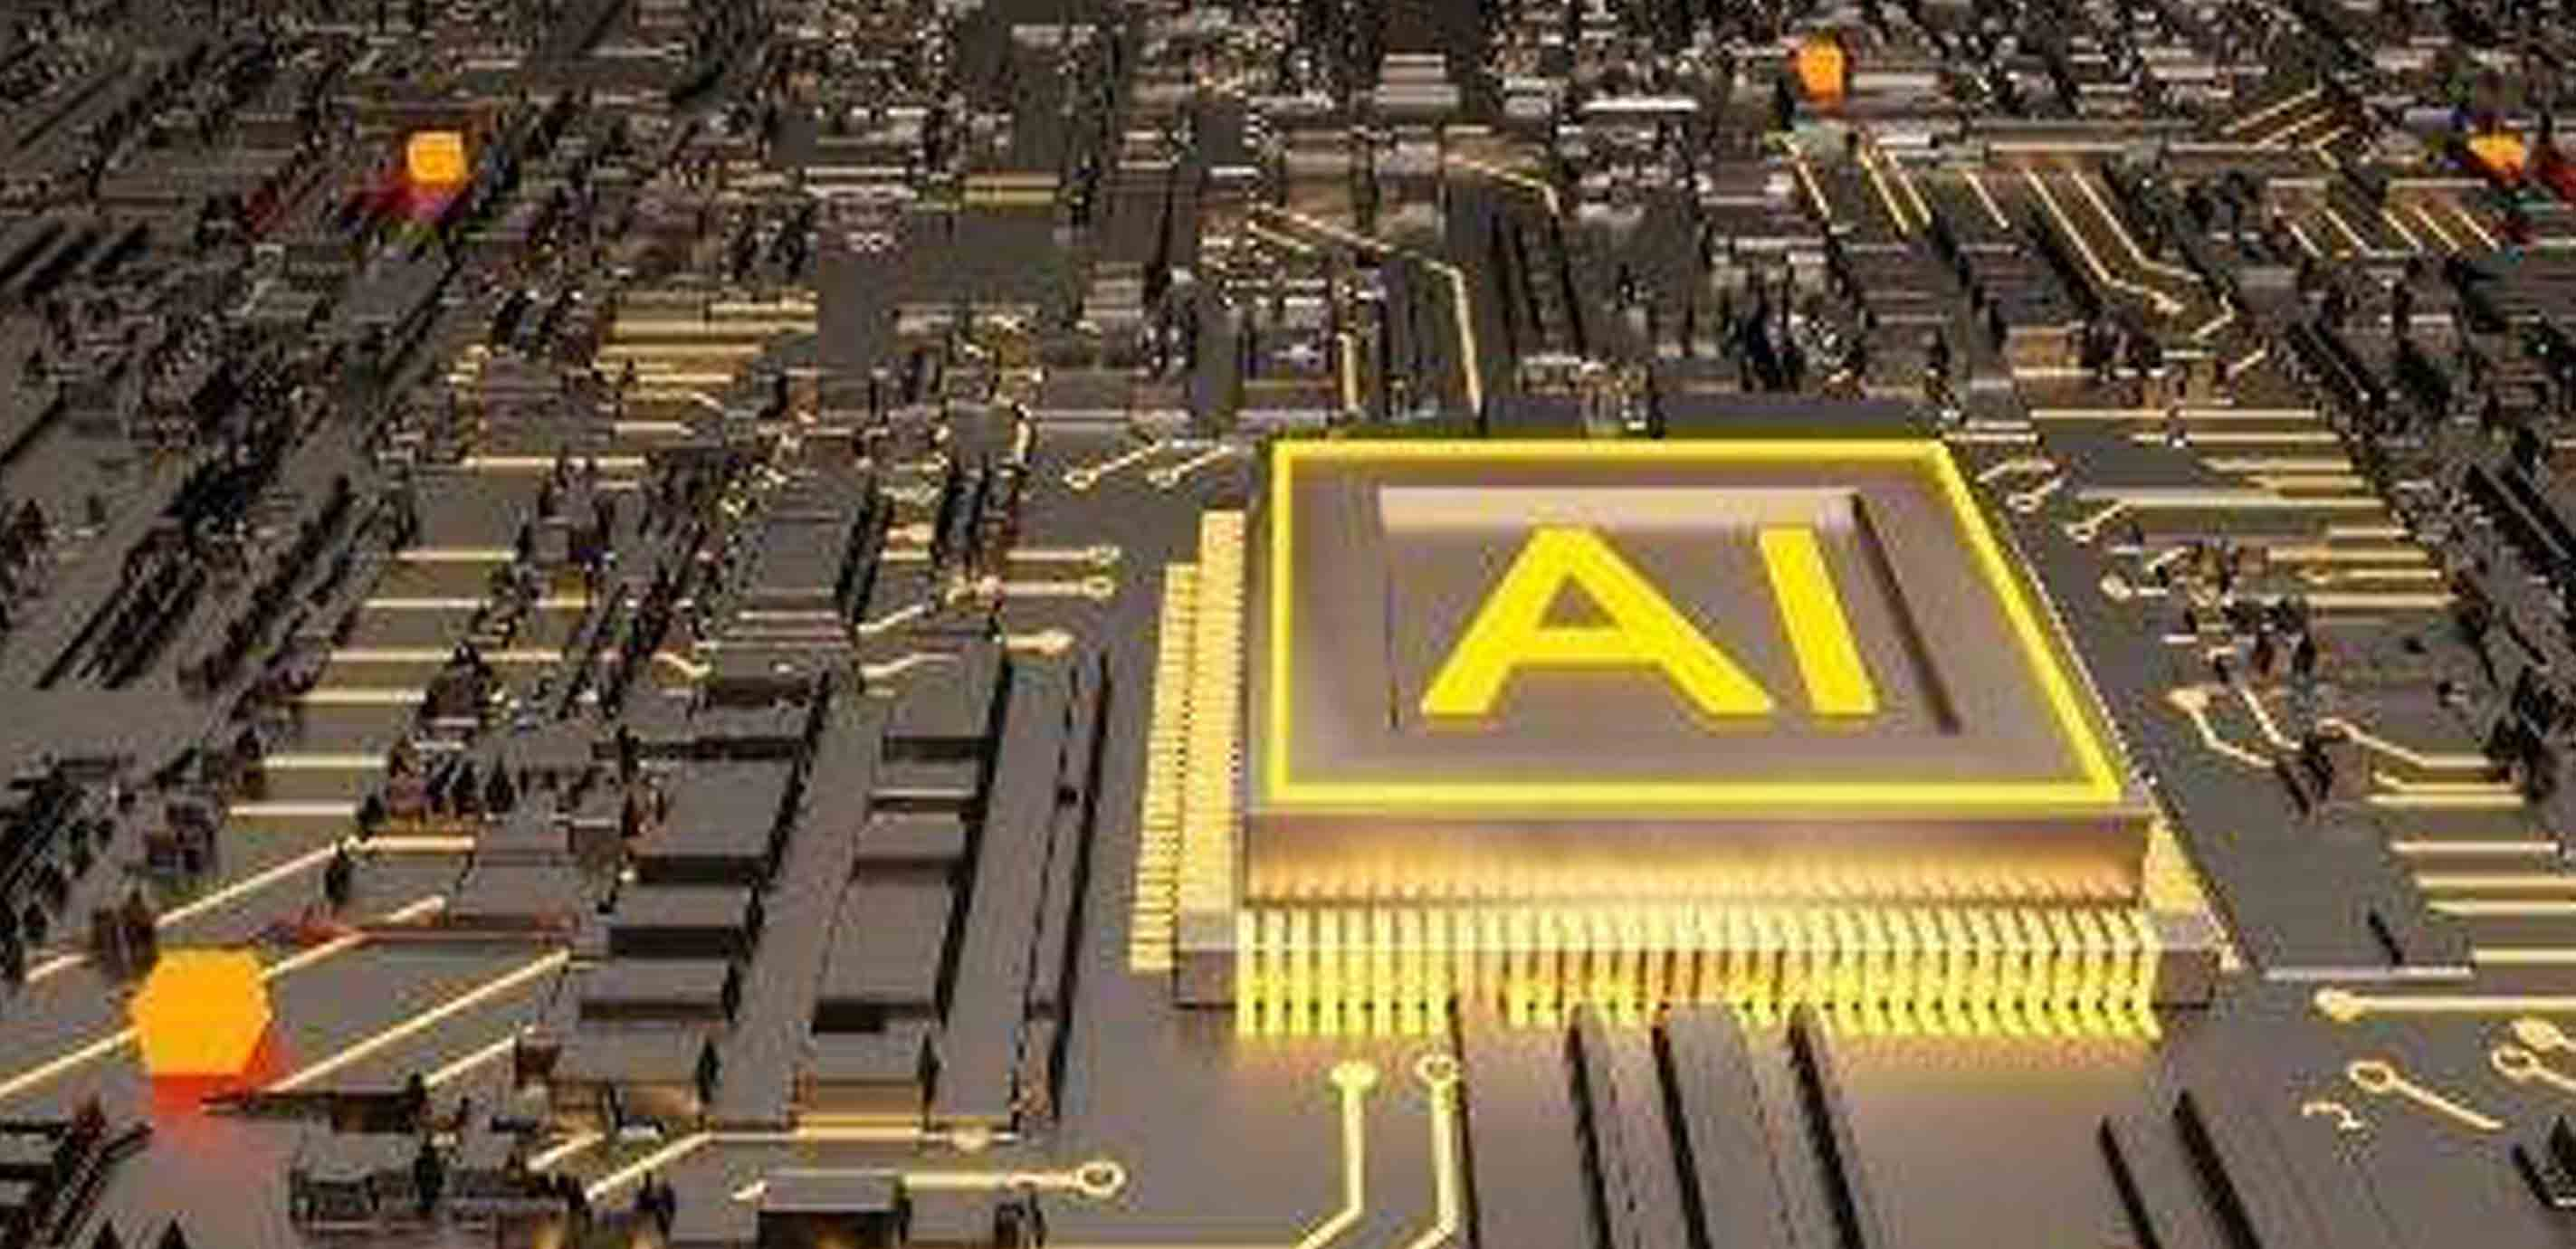 AGV搬运小车,AGV叉车,AGV小车,无人叉车,激光导航,叉车agv,仓储机器人,自动小车AGV叉车公司